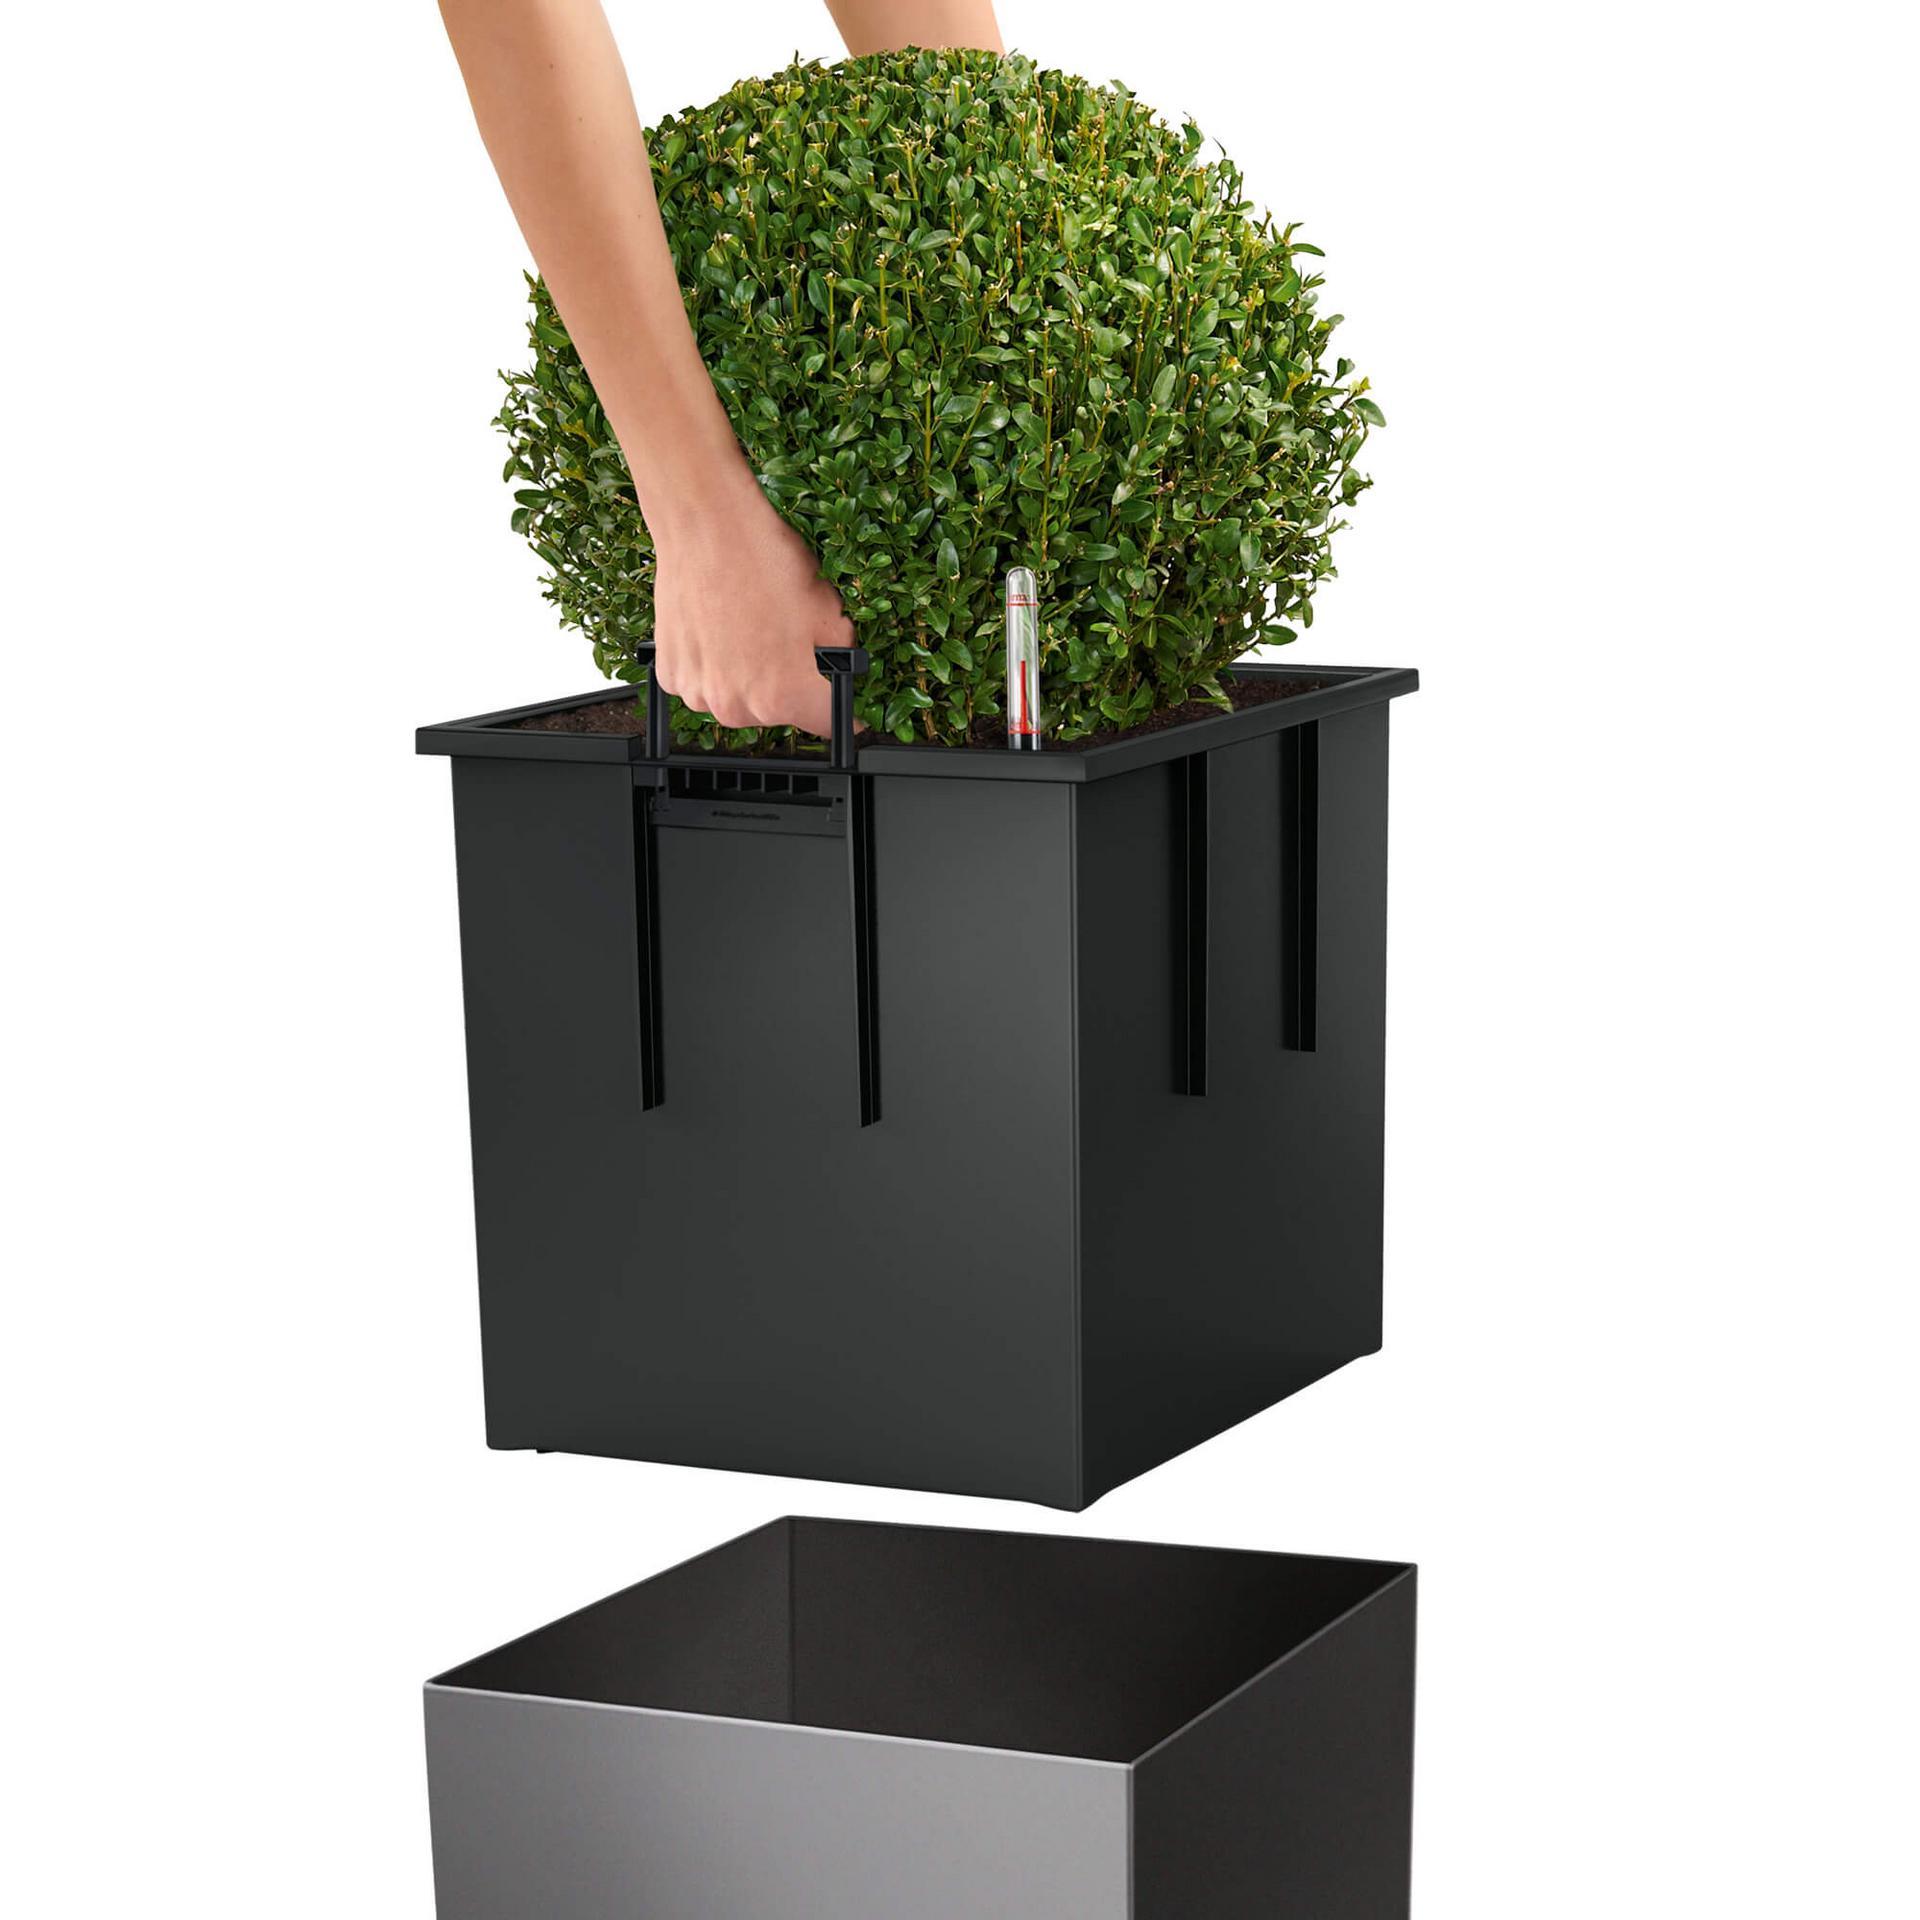 le_cube40_product_addi_liner